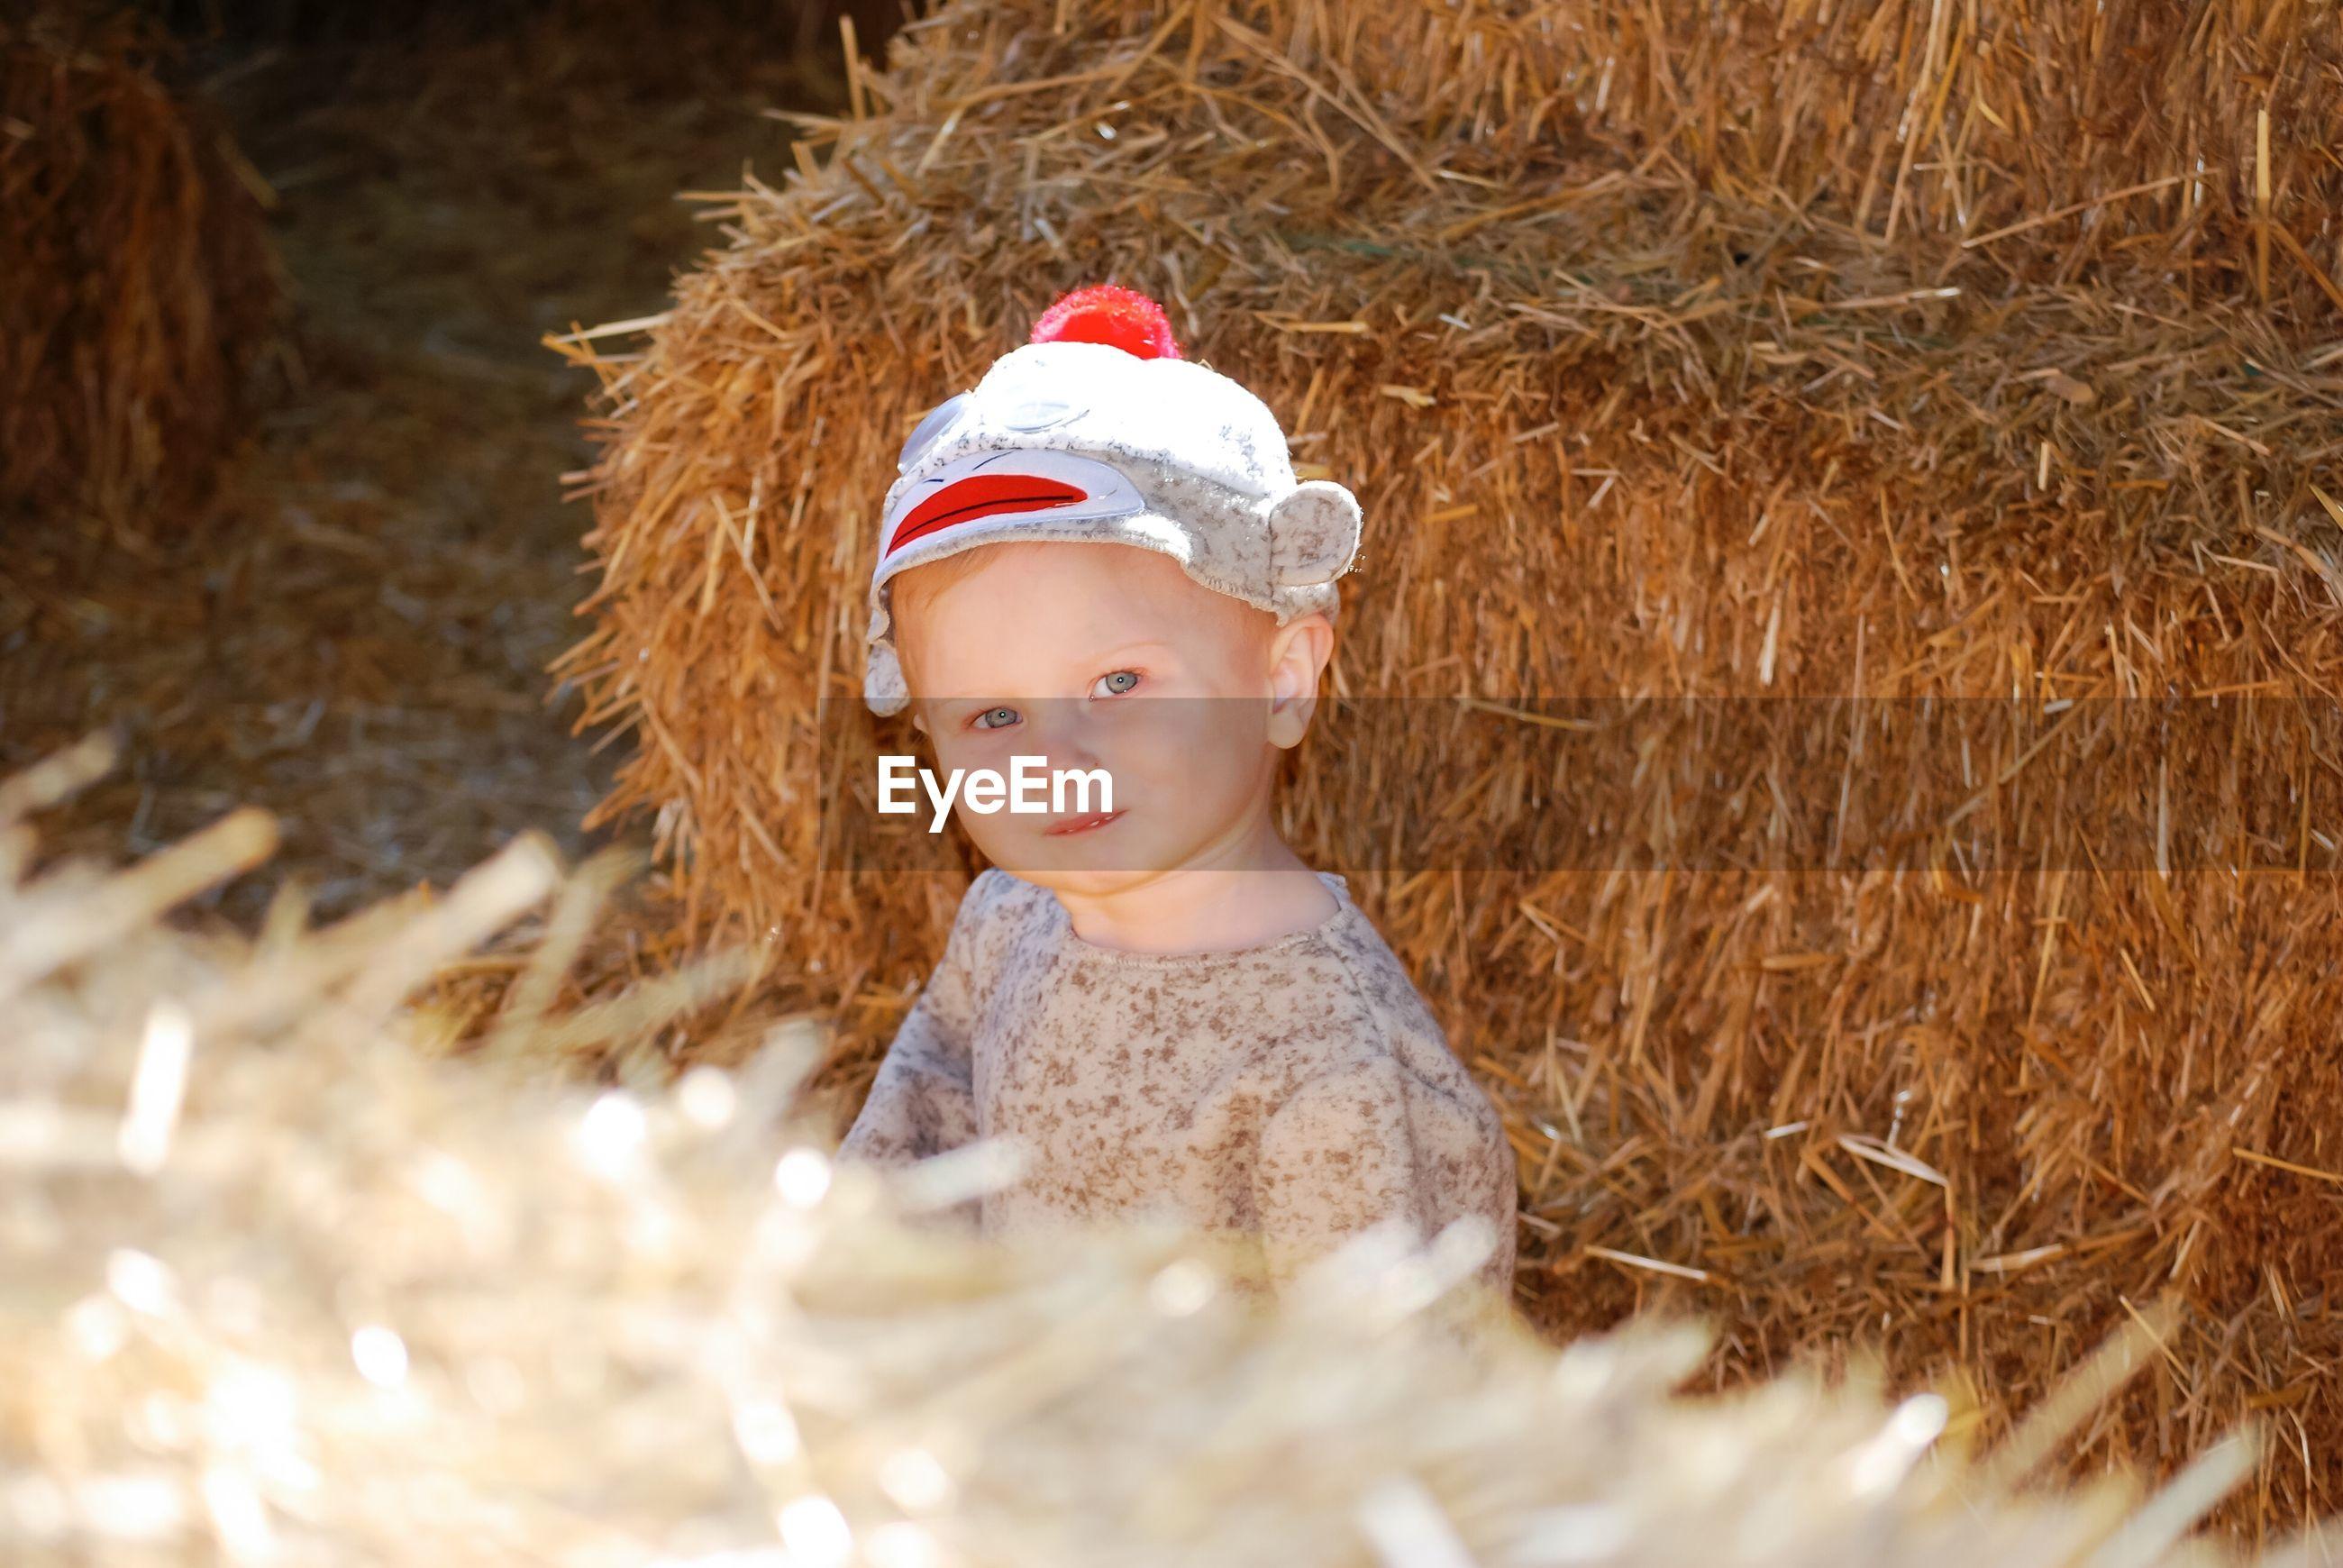 Portrait of boy sitting by hay bales